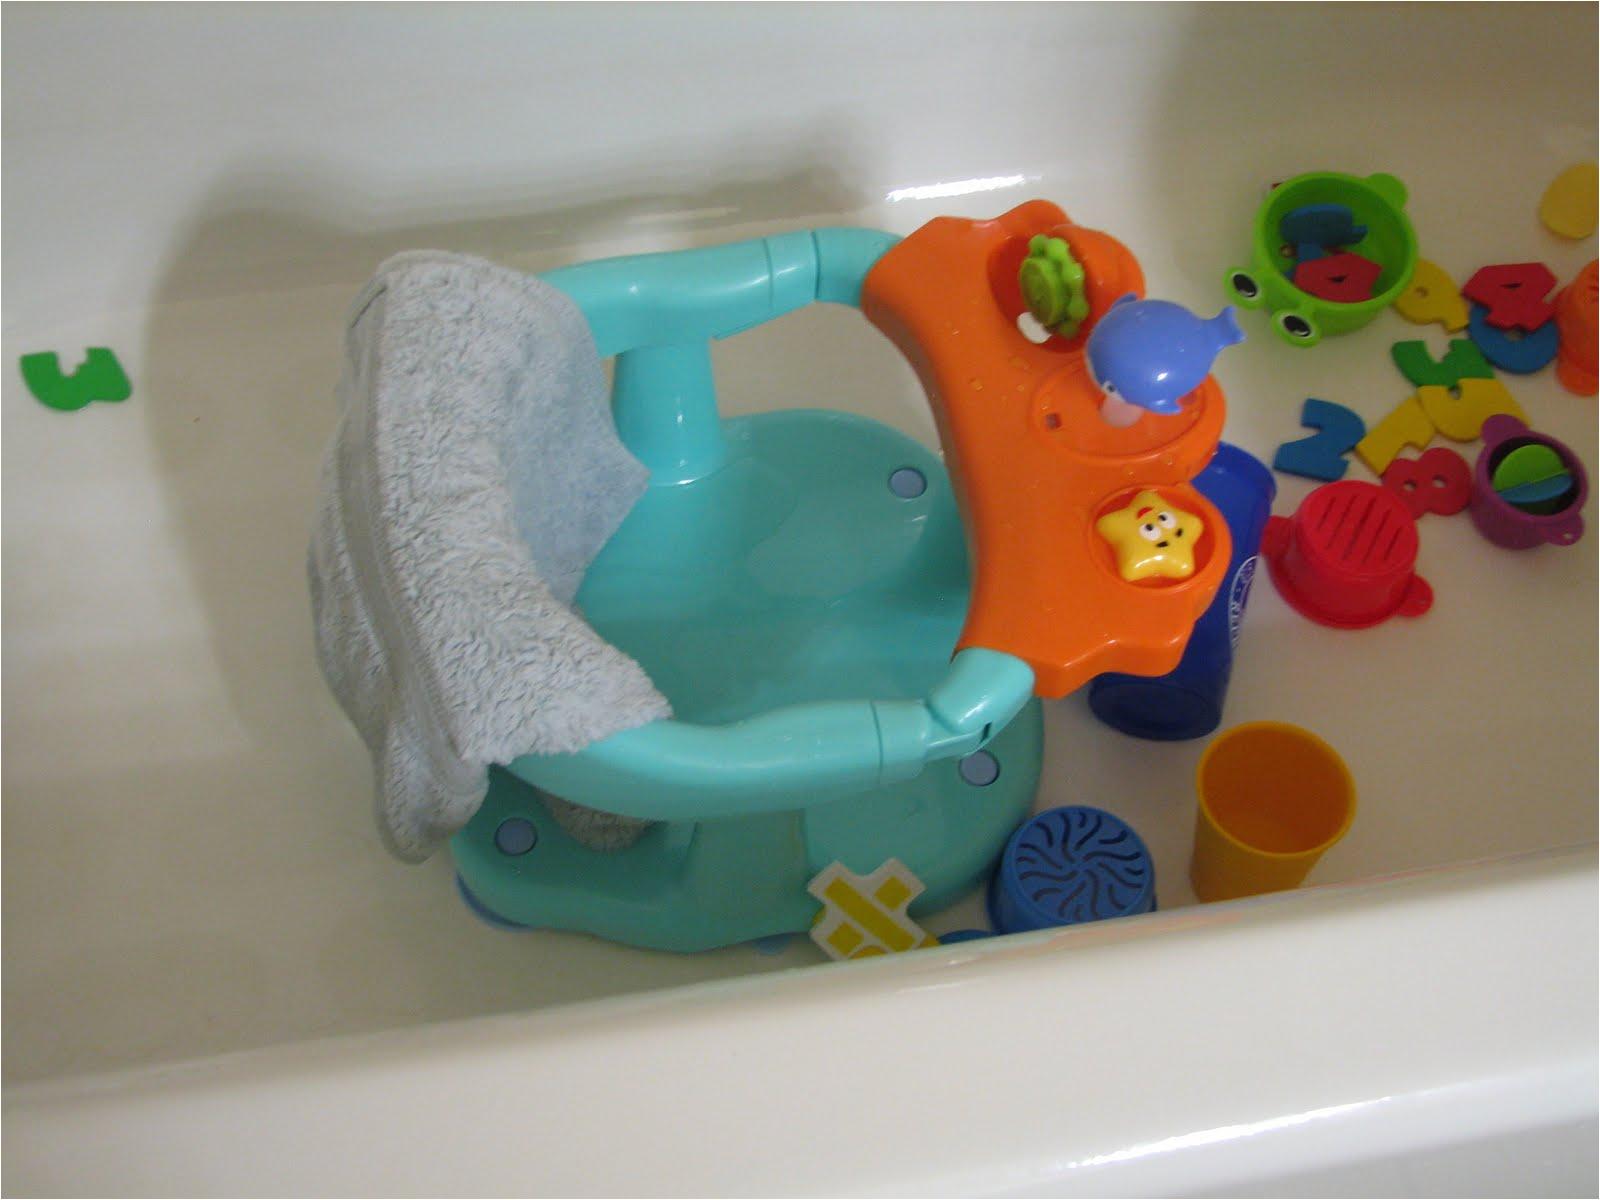 10 Baby Bathtub First Lady Of the House Infant Bath Chair